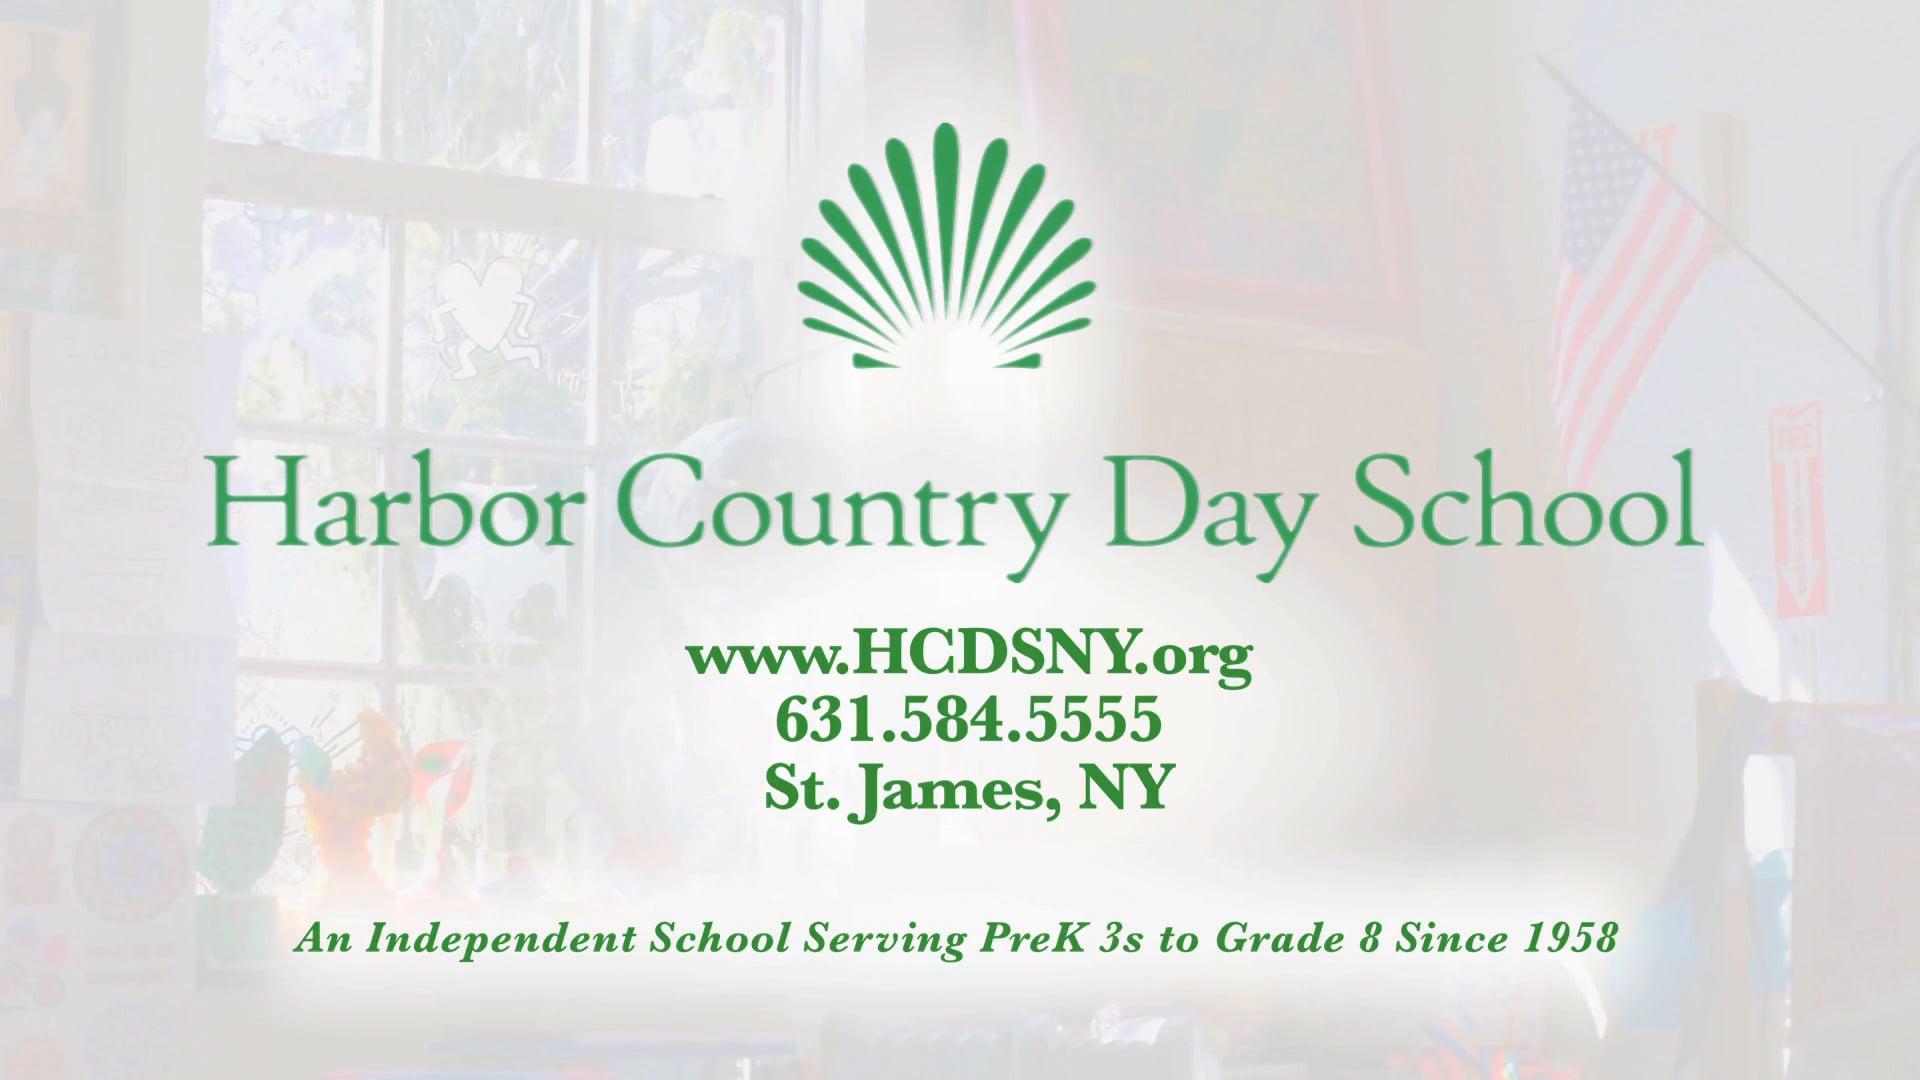 Harbor Country Day School